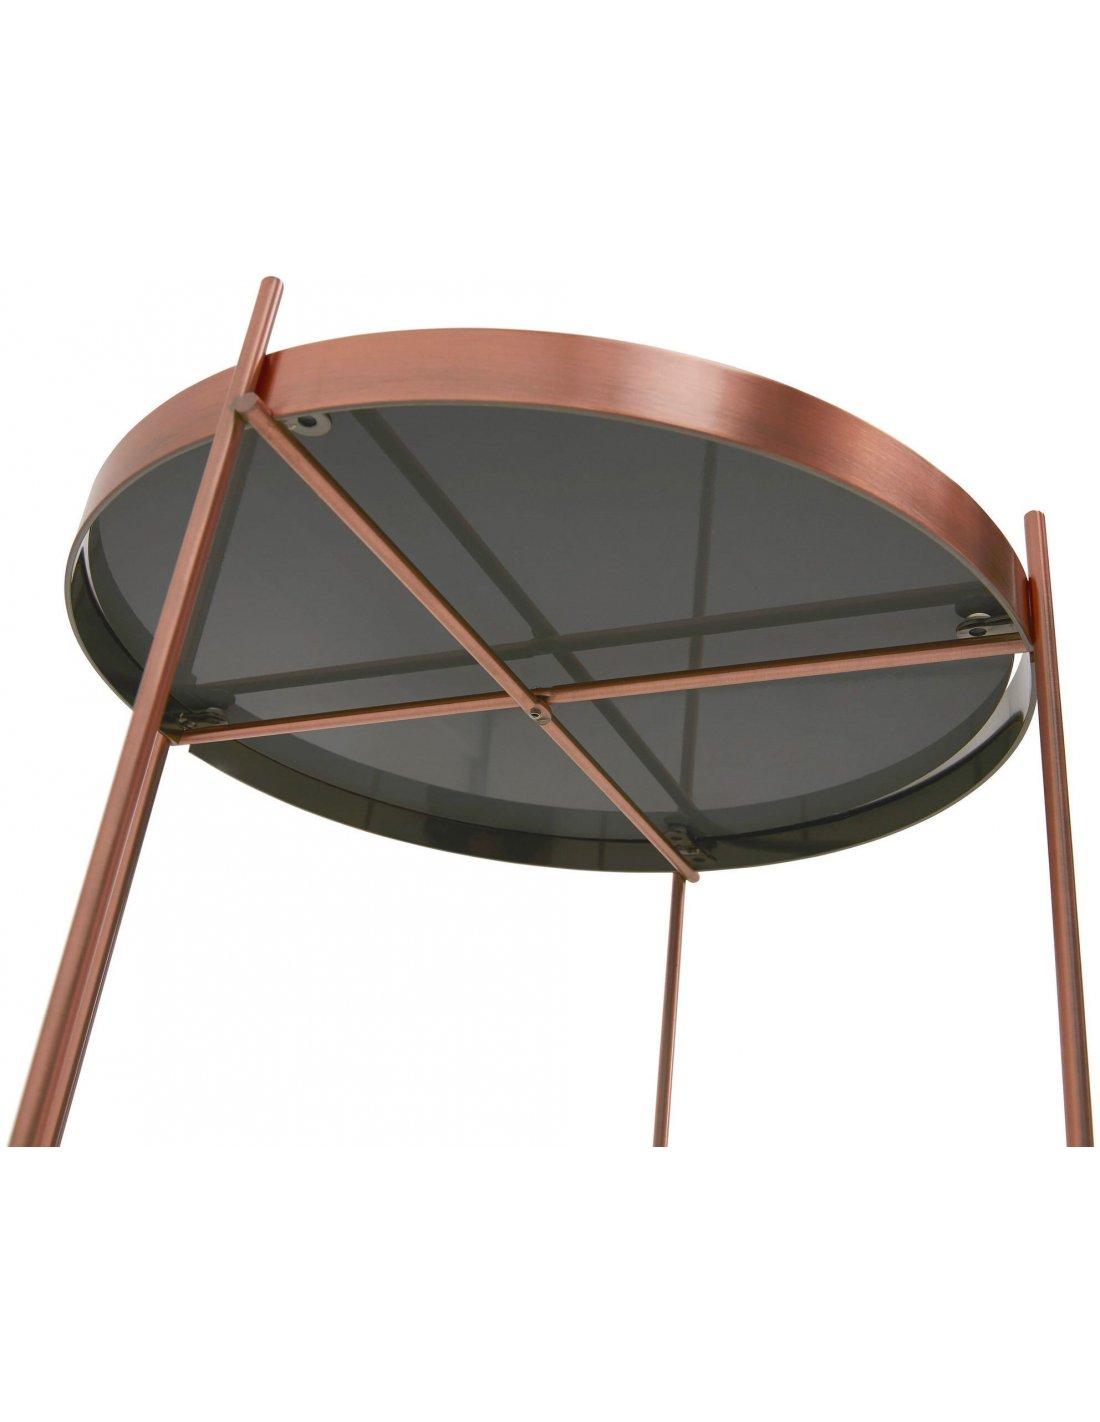 Espejo Cuivre Table Design Basse MiniKokoon PZOukiXT